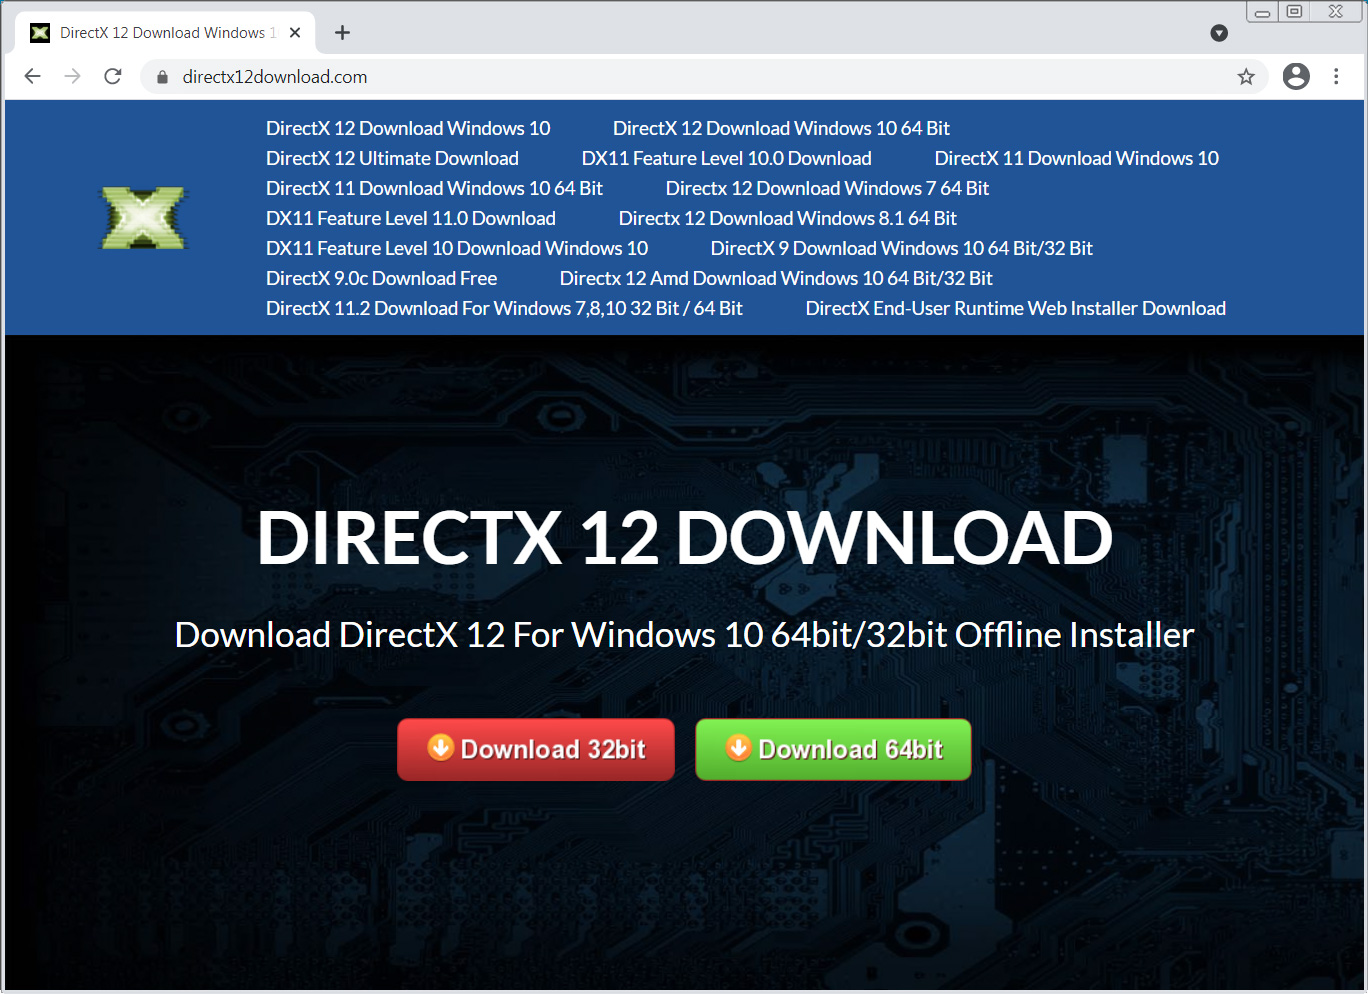 Fake Microsoft DirectX 12 download page